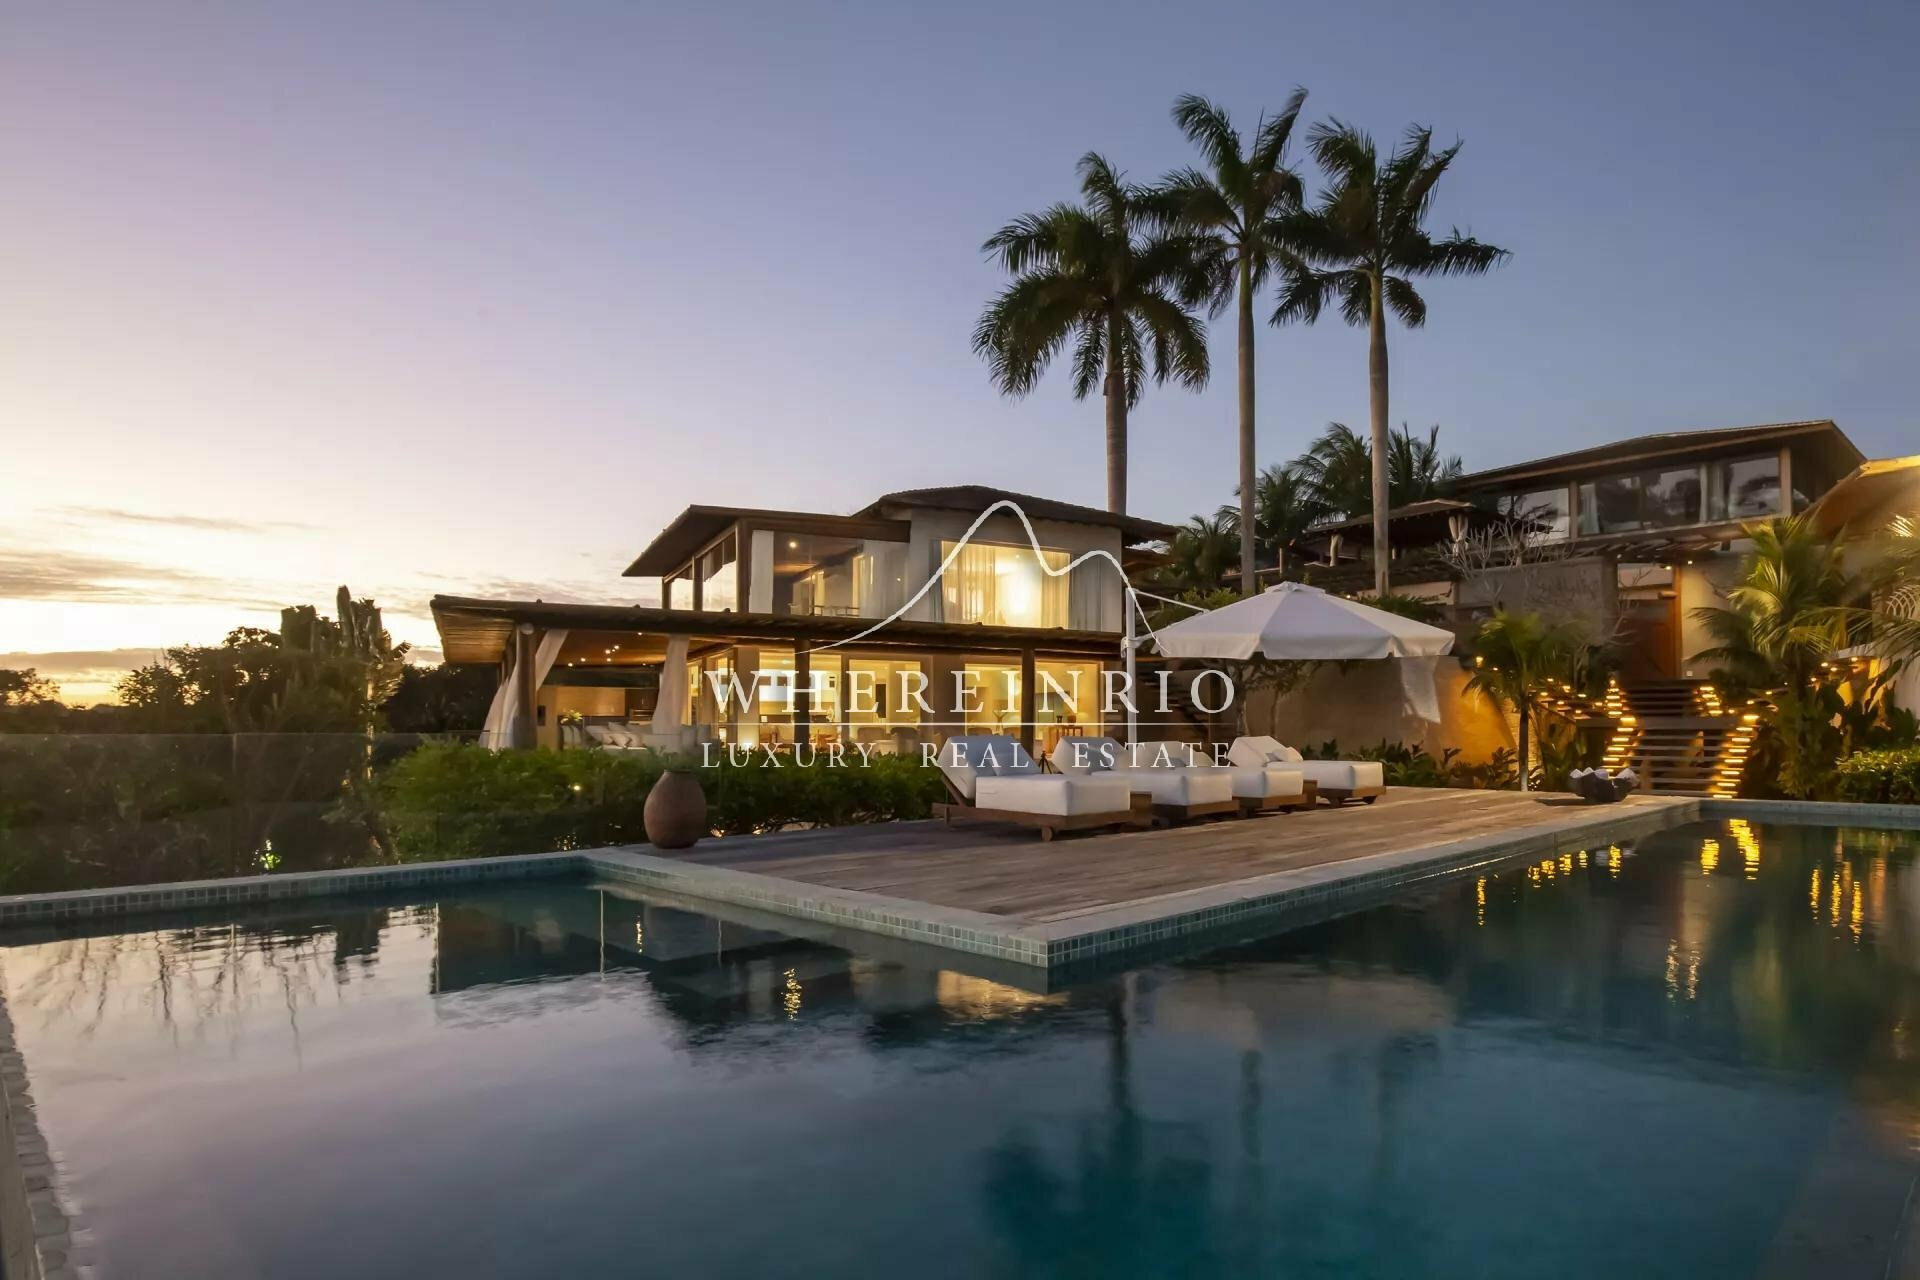 House in Arraial d'Ajuda, State of Bahia, Brazil 1